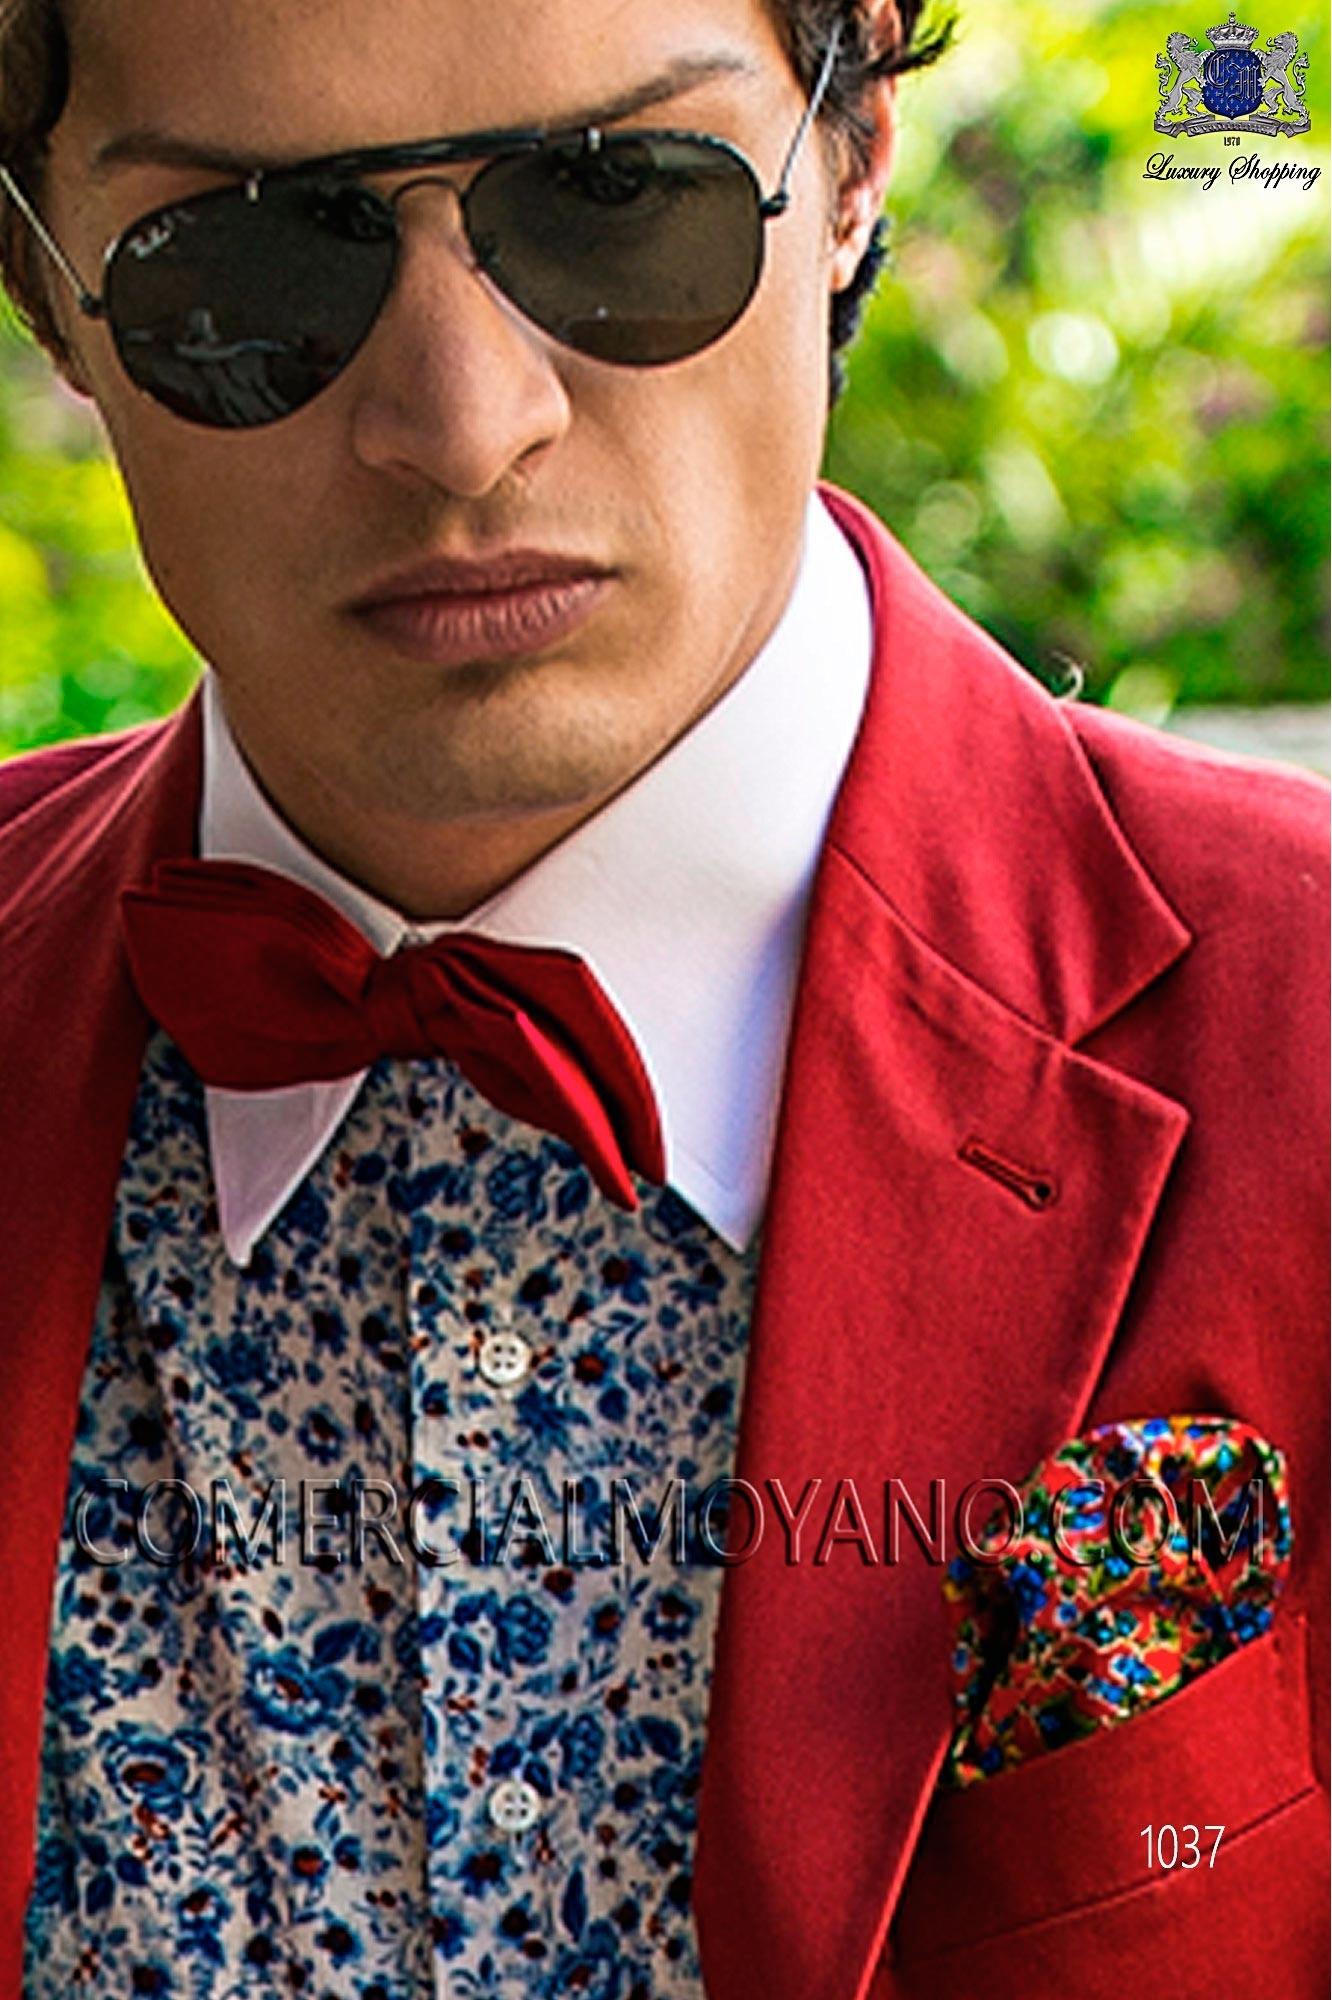 Traje Hipster de novio rojo modelo: 1037 Ottavio Nuccio Gala colección Hipster